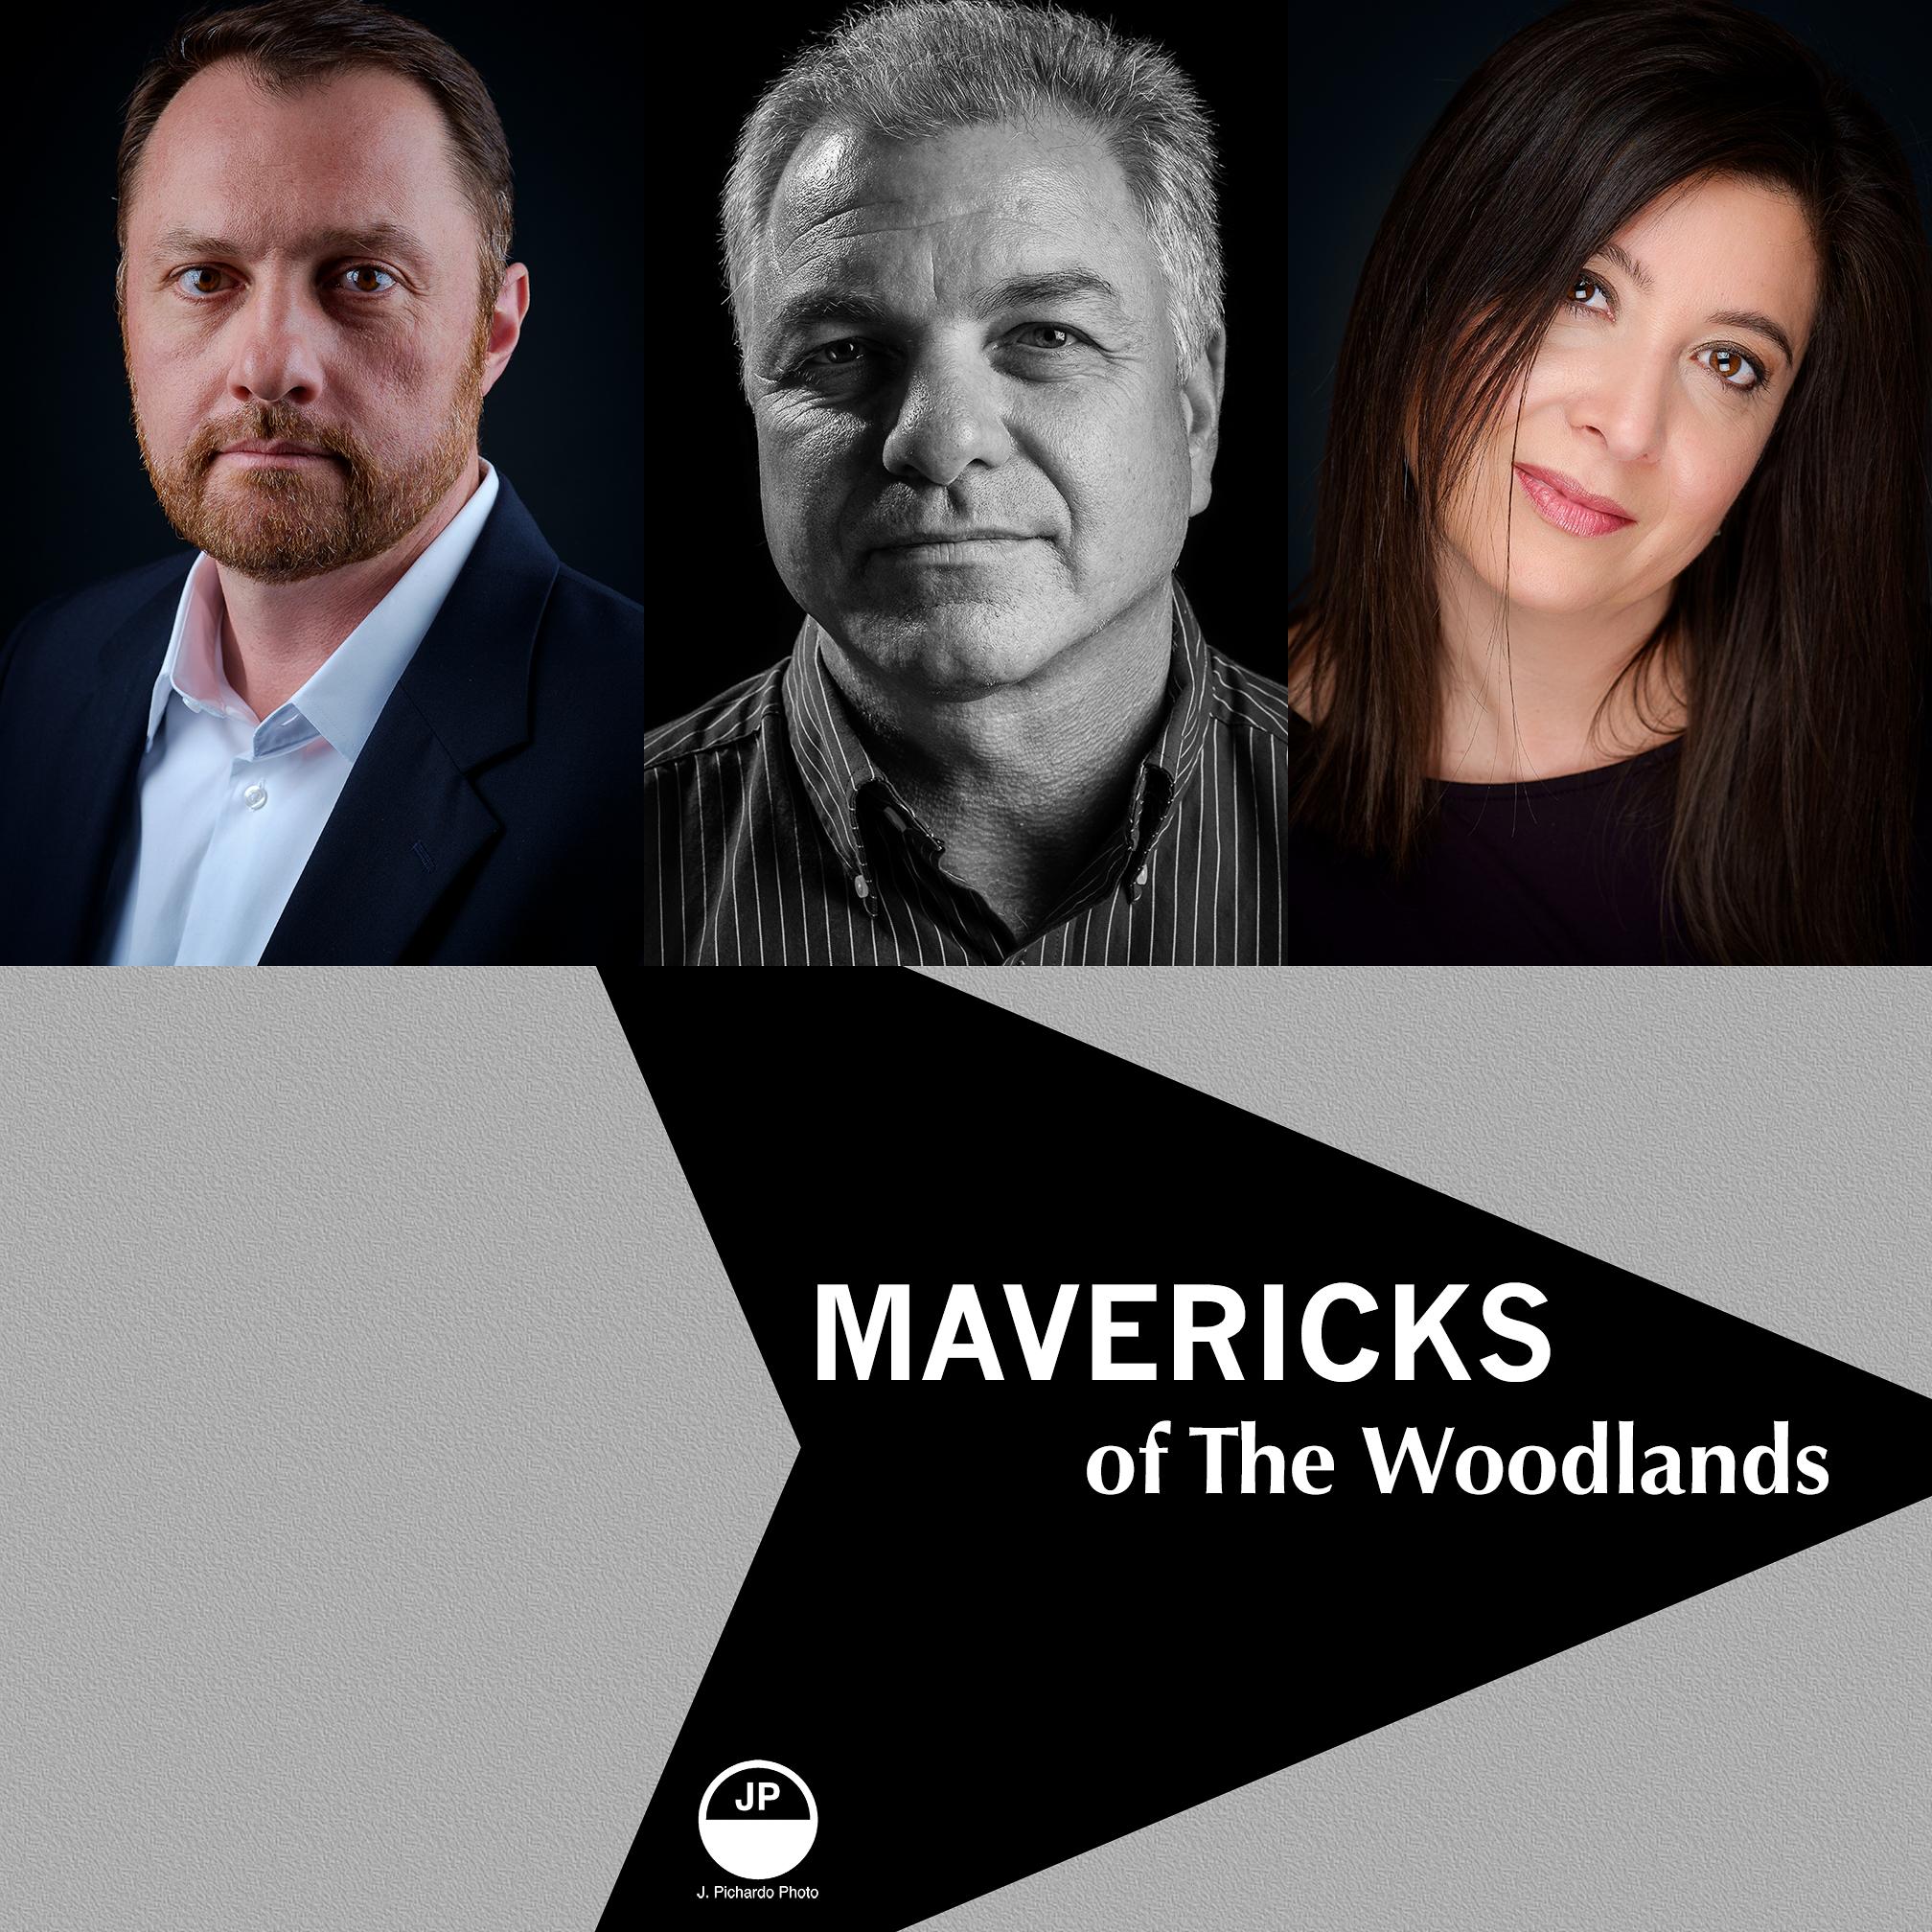 Mavericks of the Woodlands 1